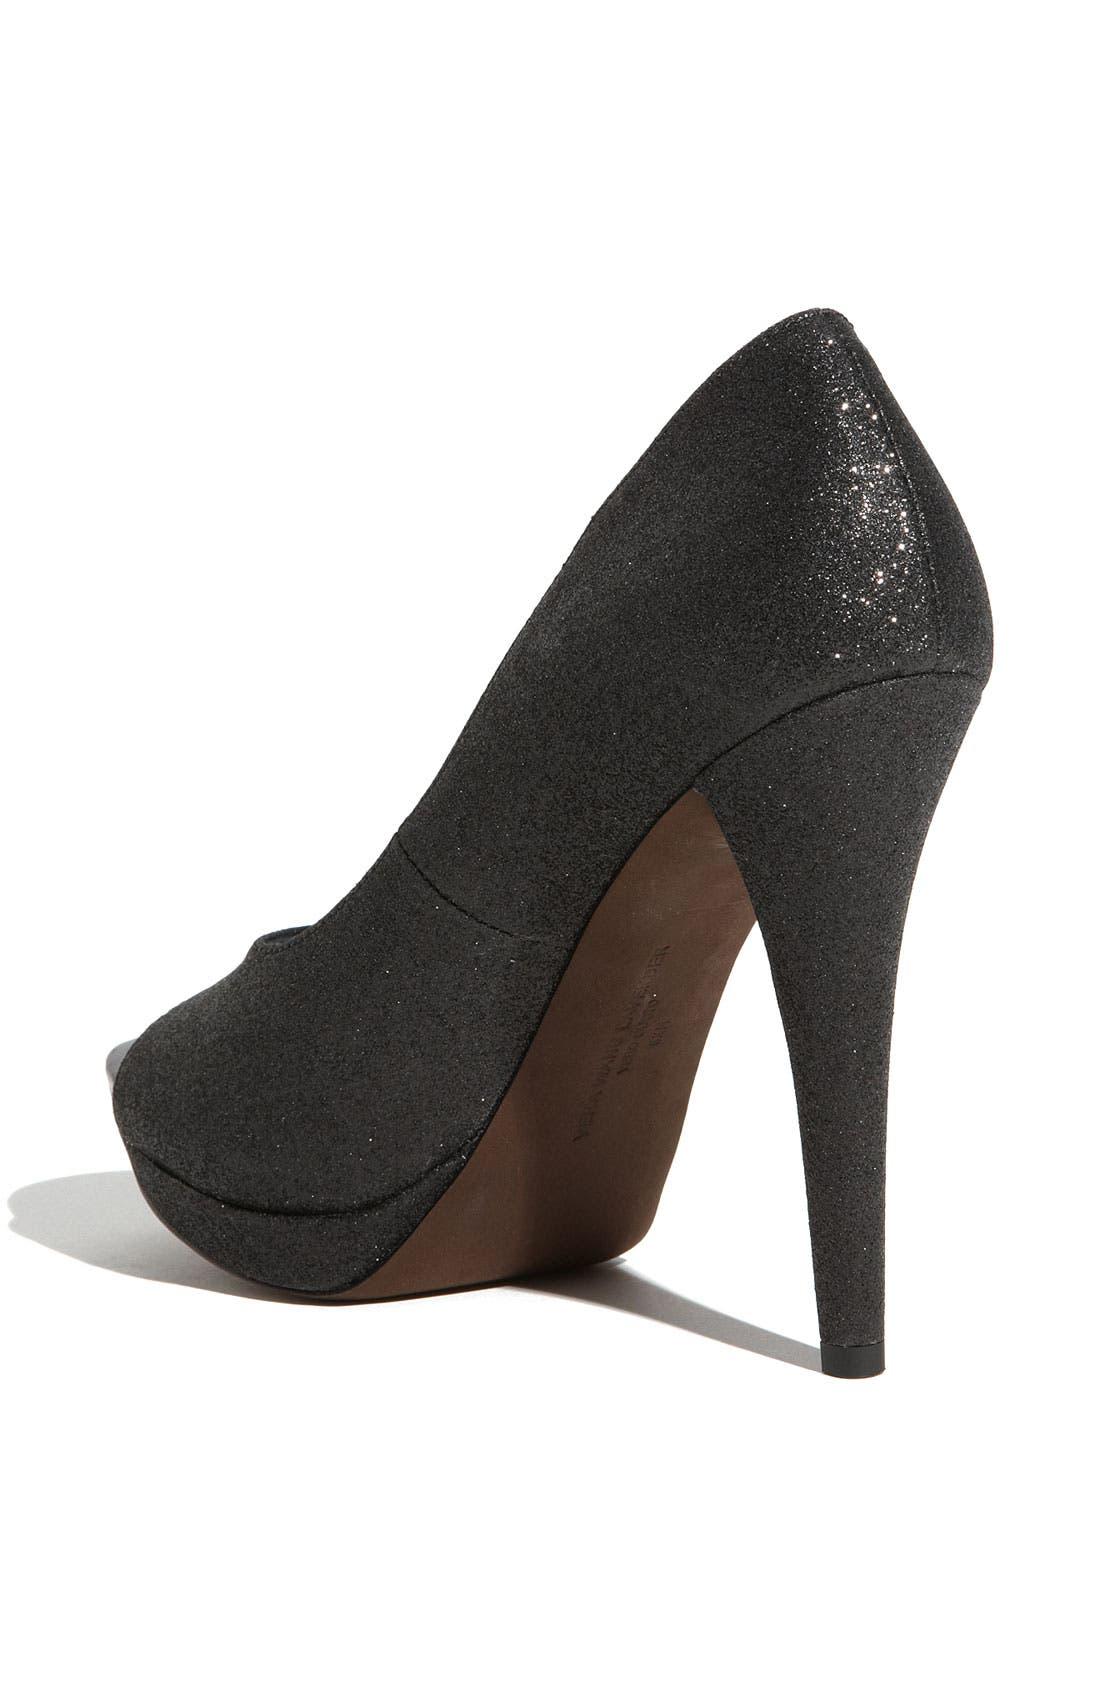 Footwear 'Selima' Peep Toe Pump,                             Alternate thumbnail 8, color,